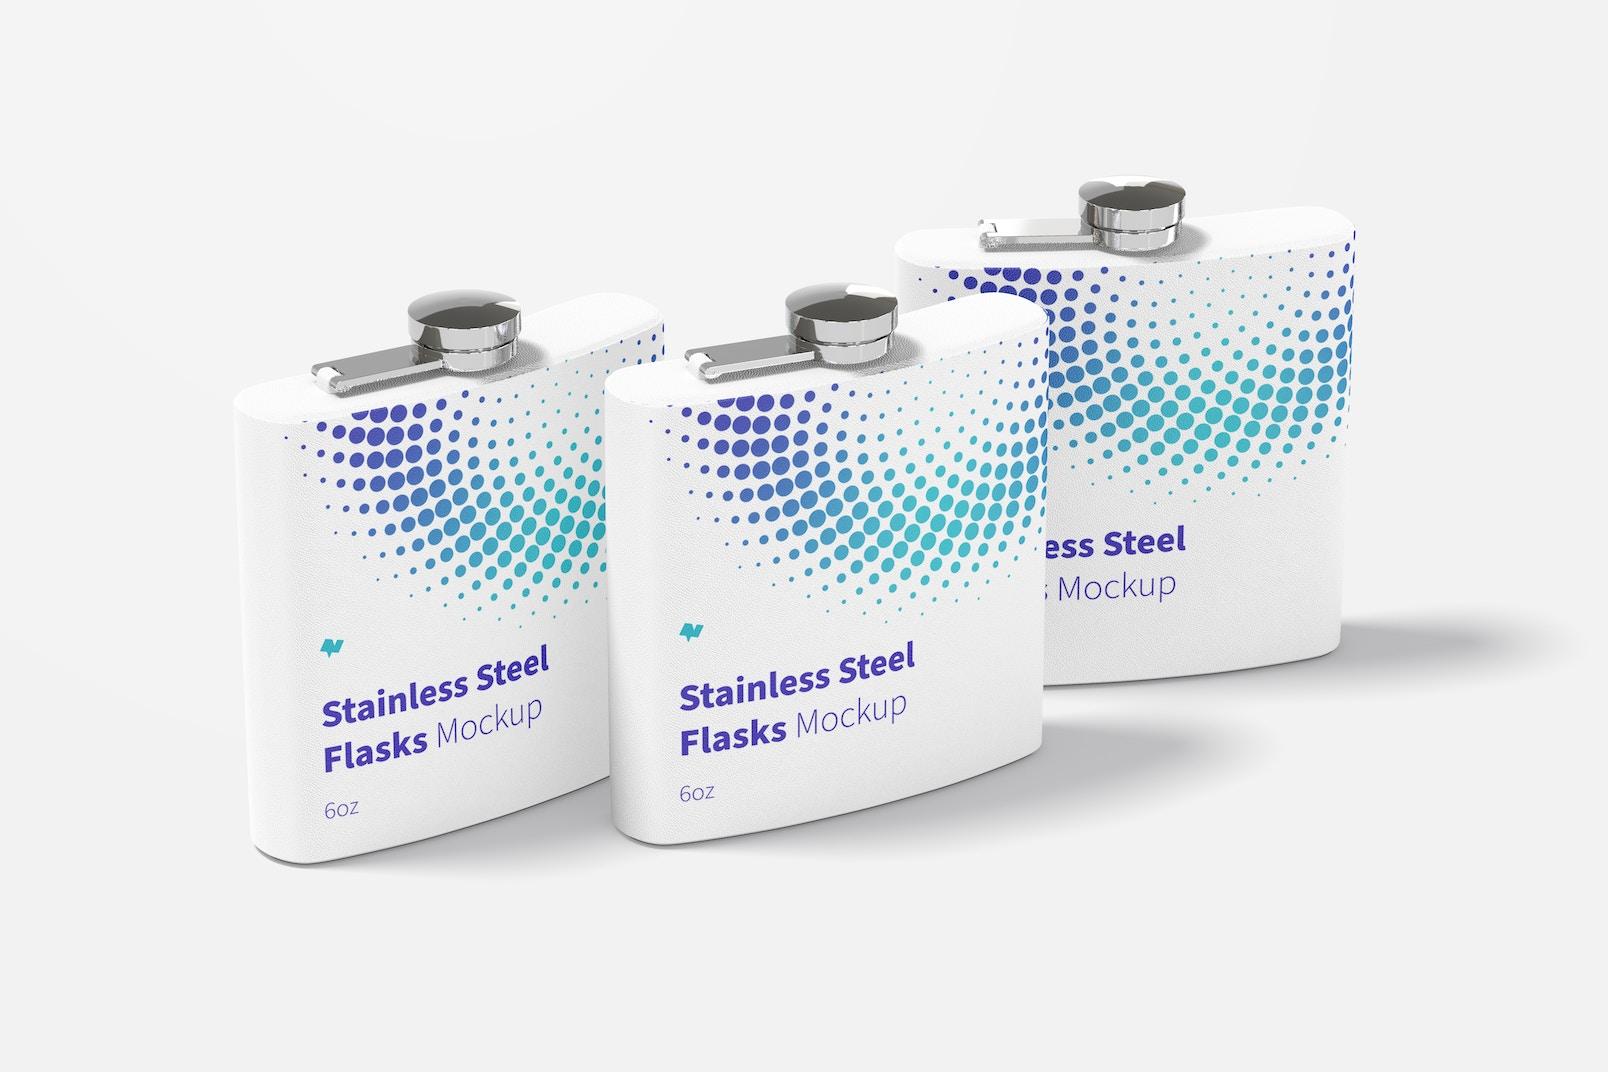 Powder Coated Stainless Steel Flasks Set Mockup